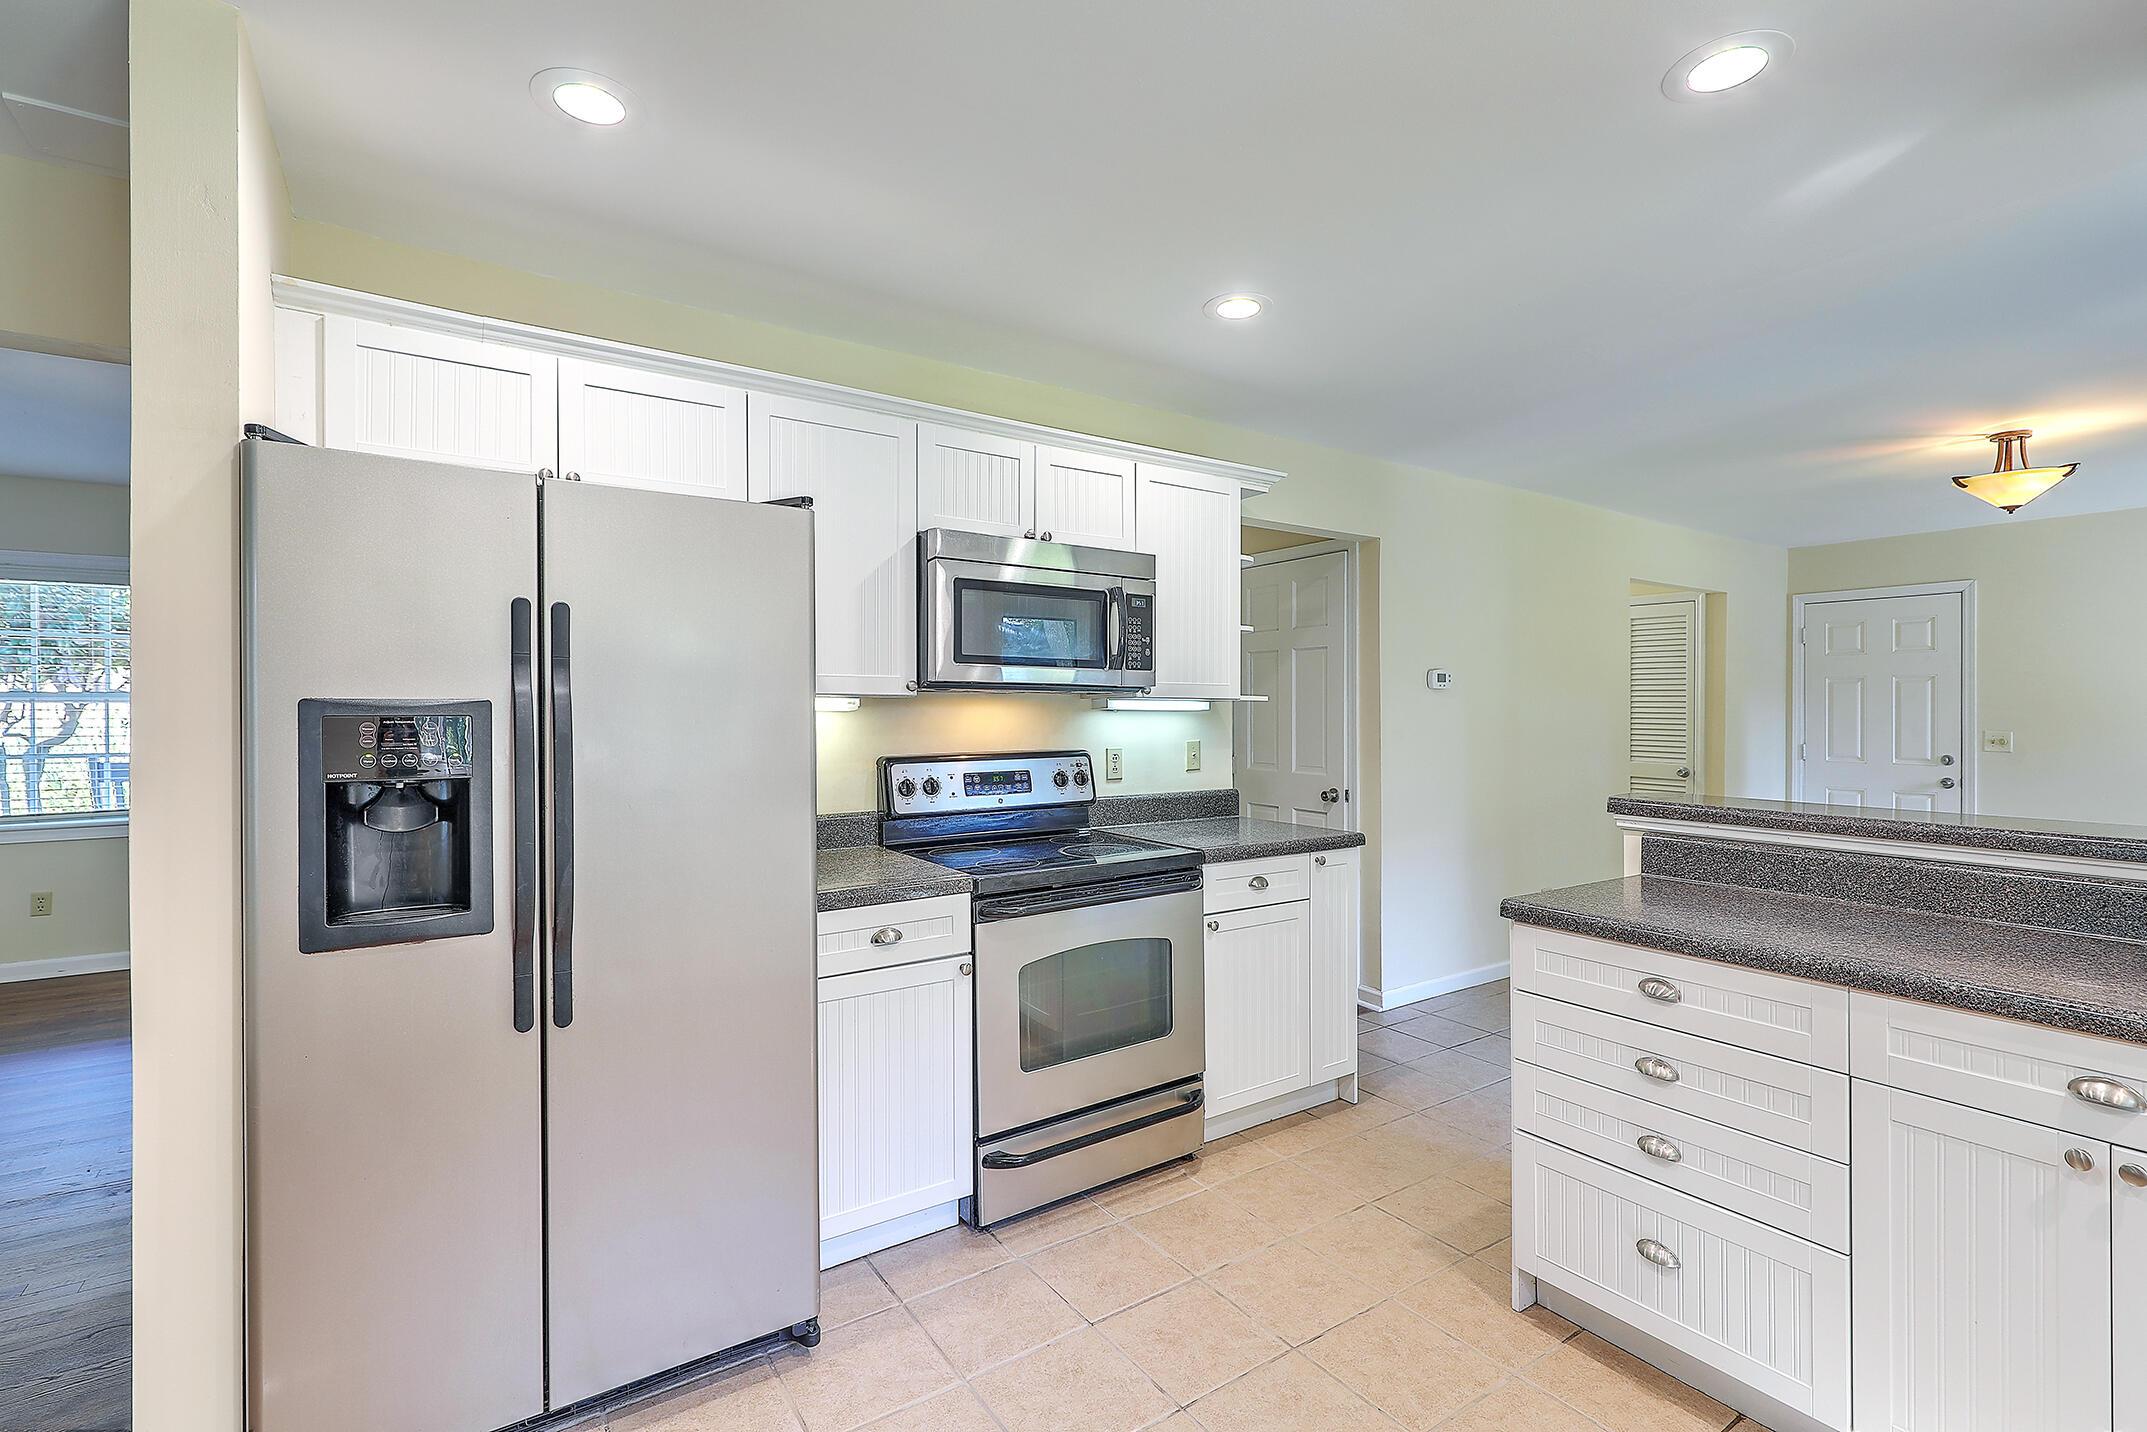 Cooper Estates Homes For Sale - 901 Searle, Mount Pleasant, SC - 20